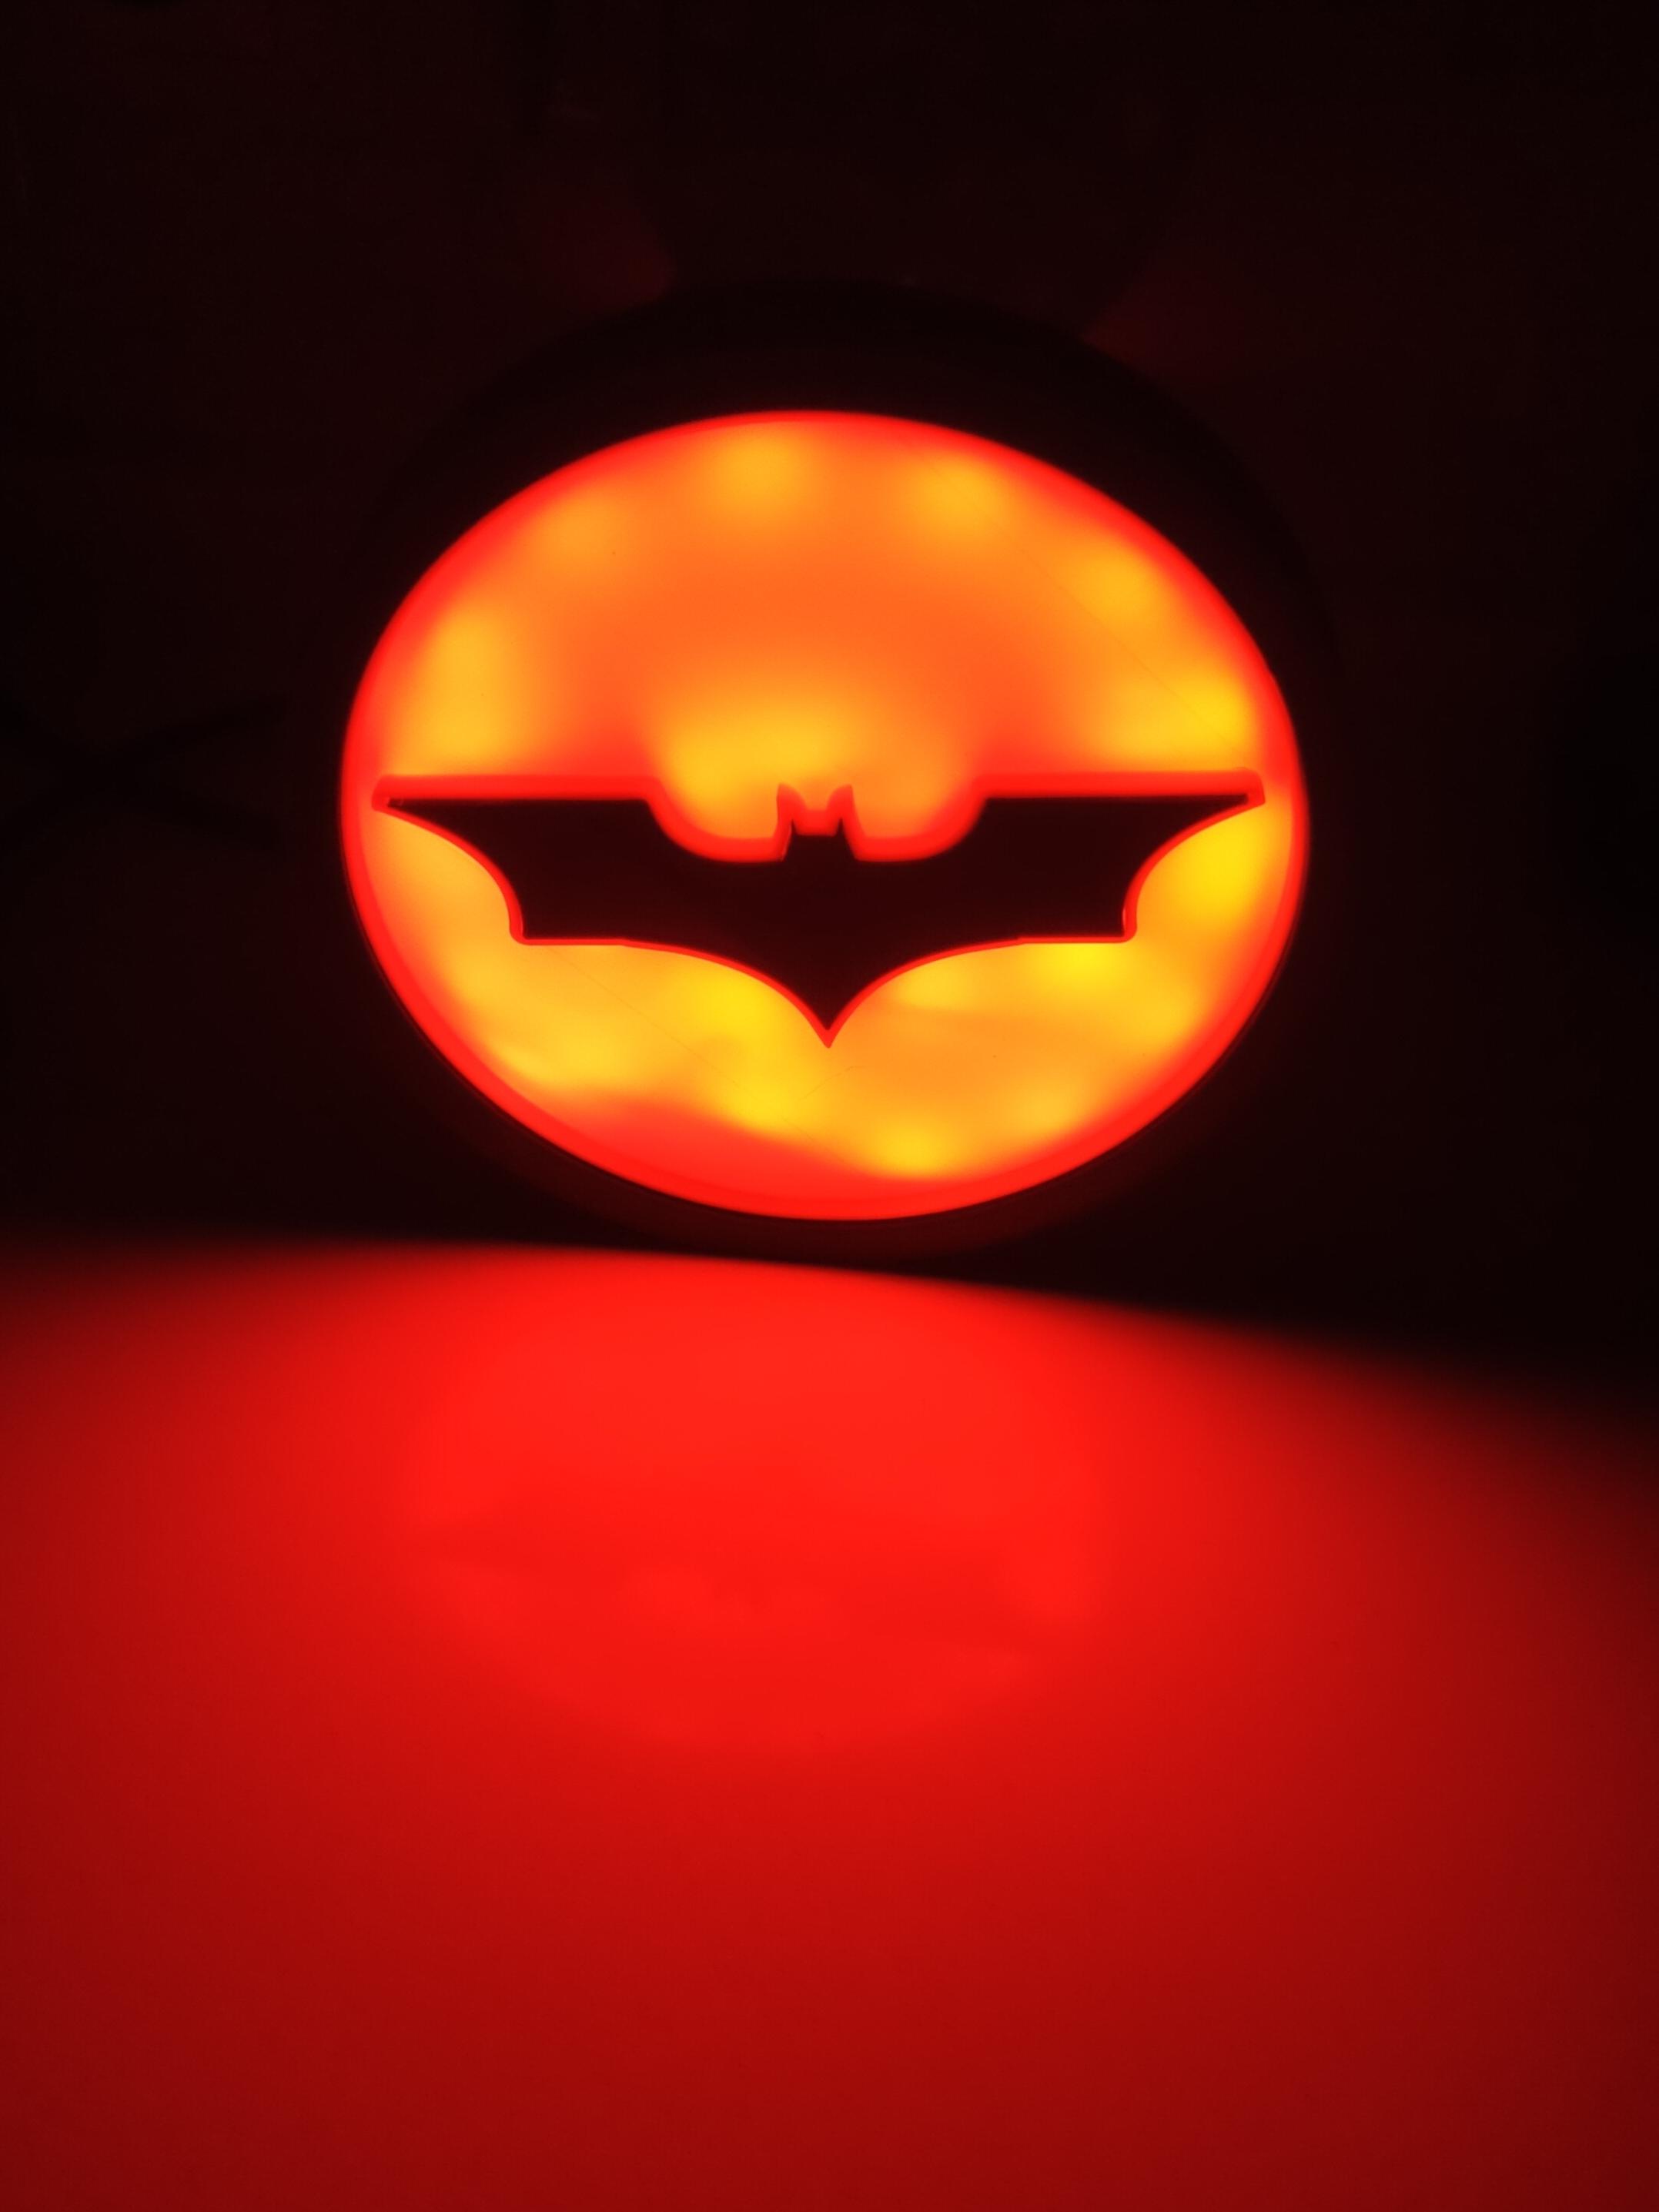 IMG_20210113_212725.jpg Download STL file ILLUMINATED SIGN BATMAN BATSIGNAL • 3D printer model, librexviii